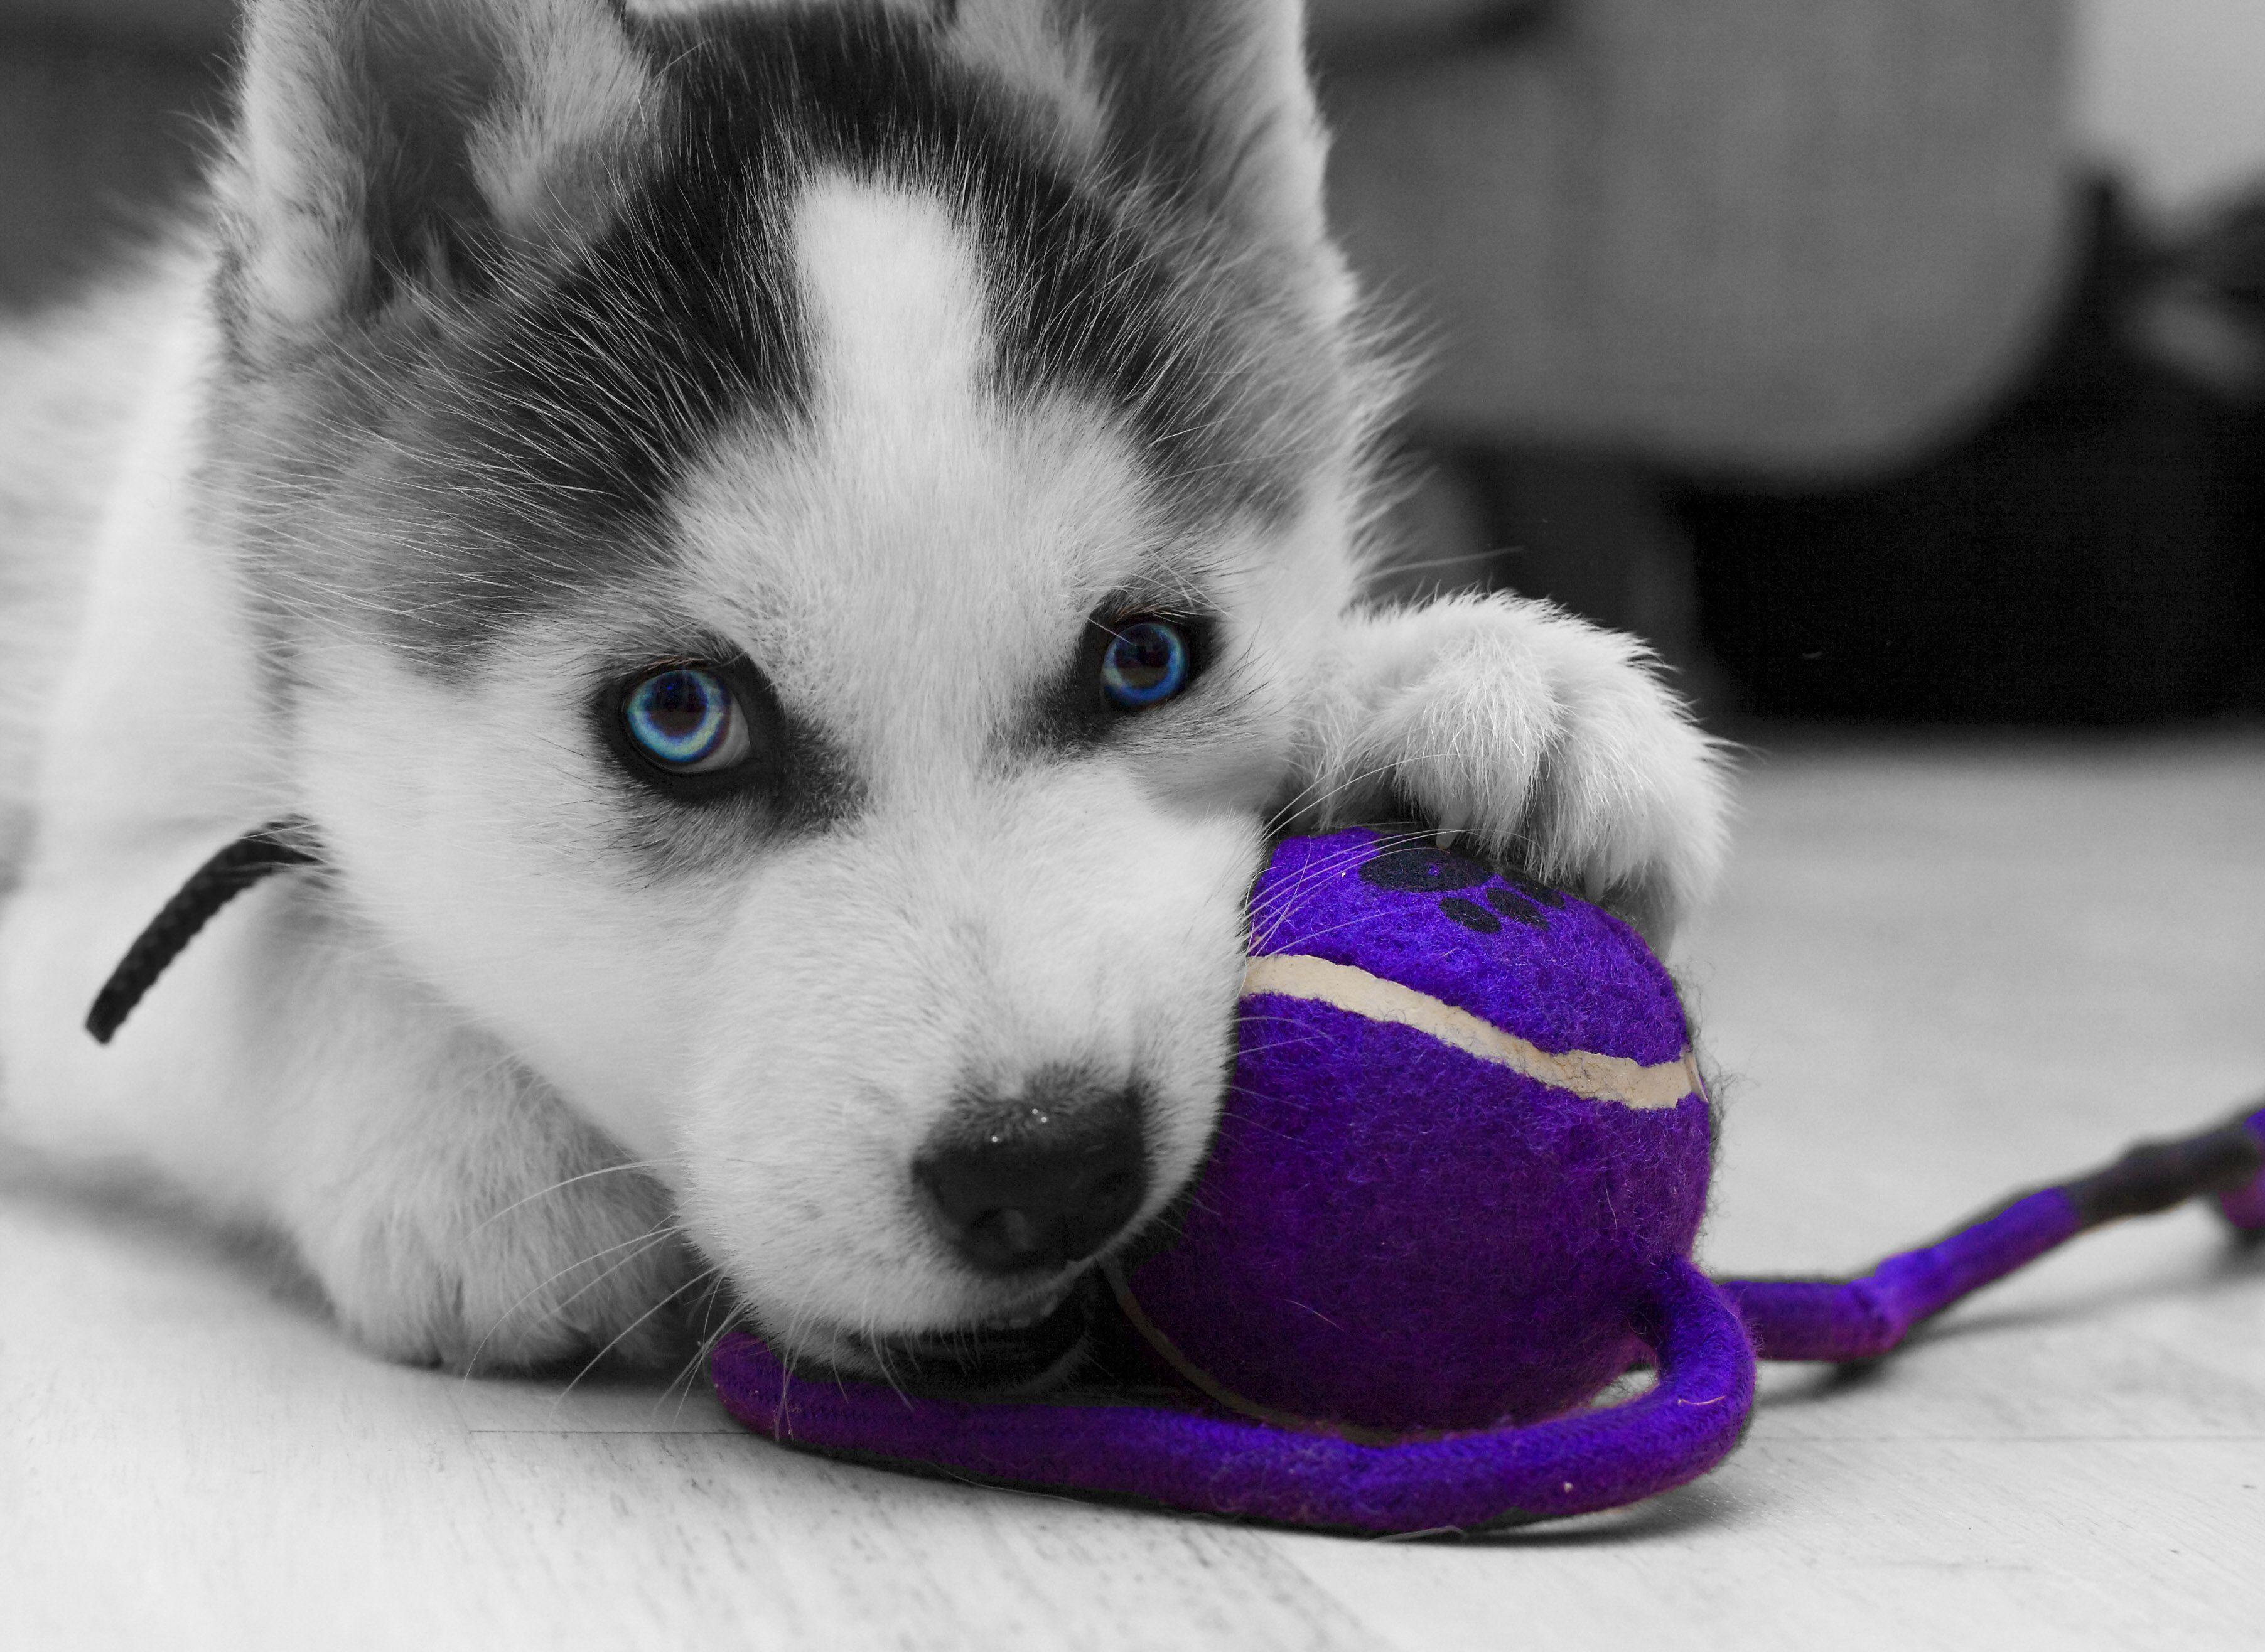 Animal Wallpaper Husky Puppies Hd Wallpaper For Desktop From